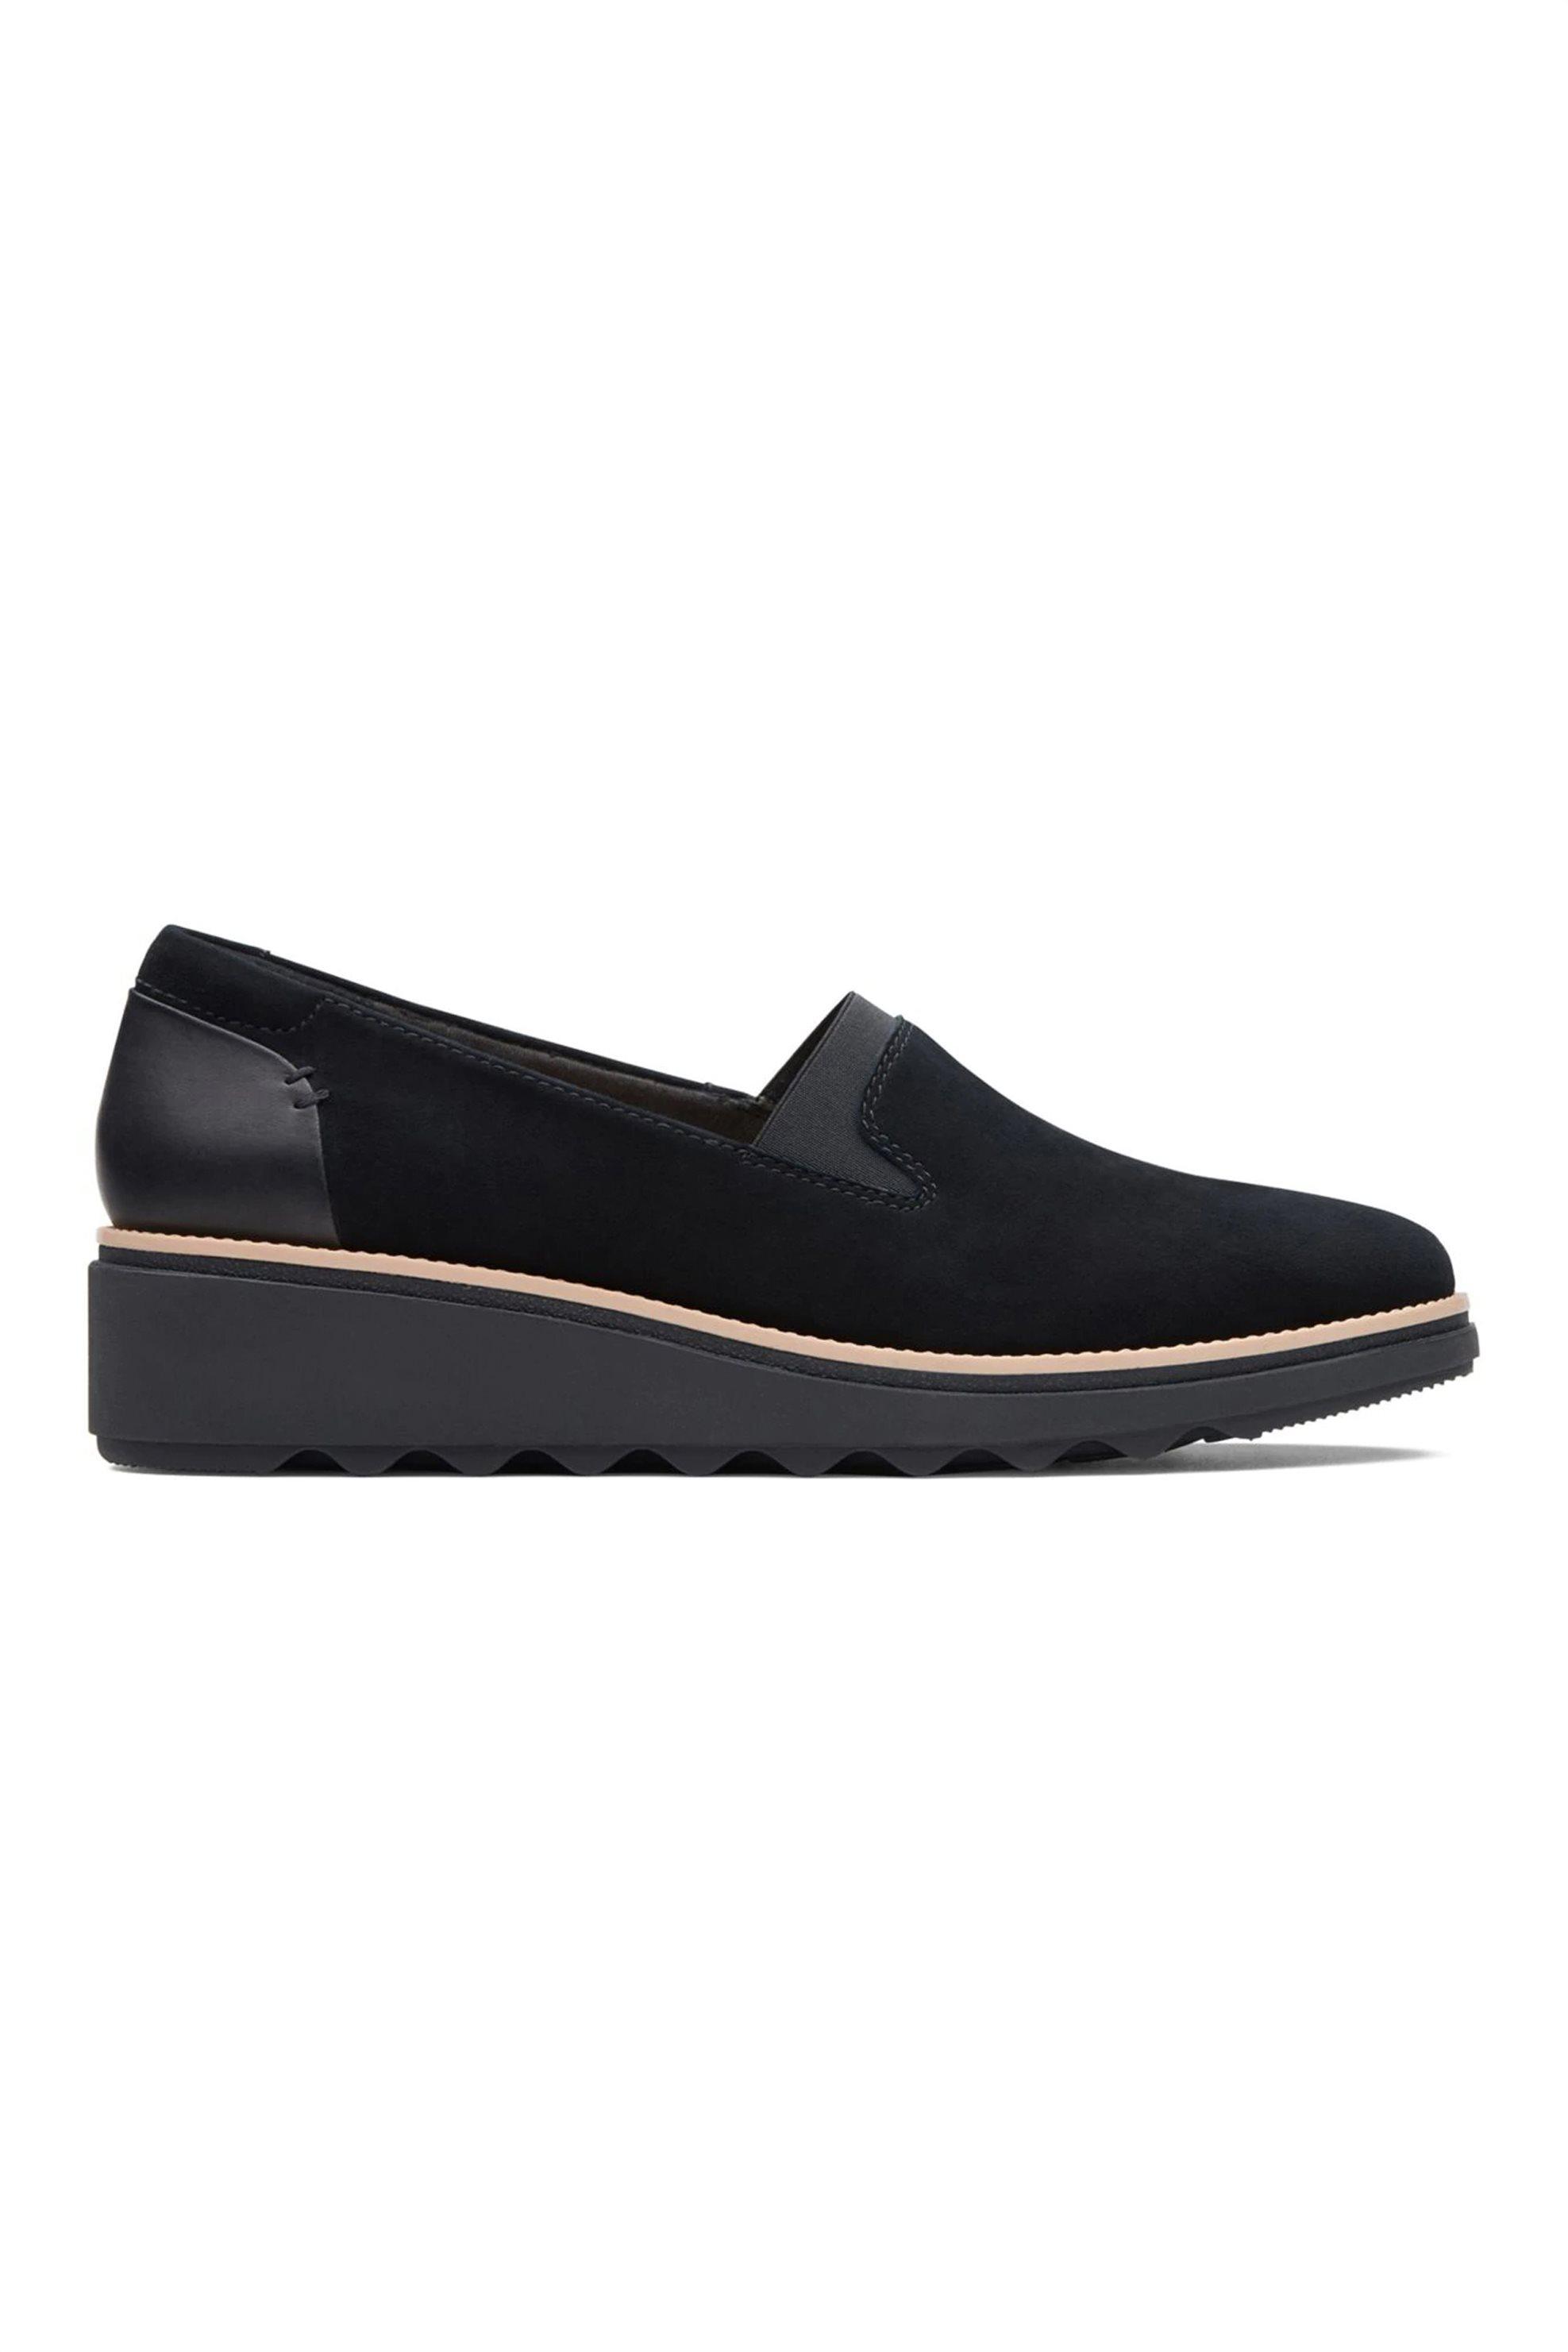 Clarks γυναικεία παπούτσια slip on «Sharon Dolly» – 26136359 – Μαύρο